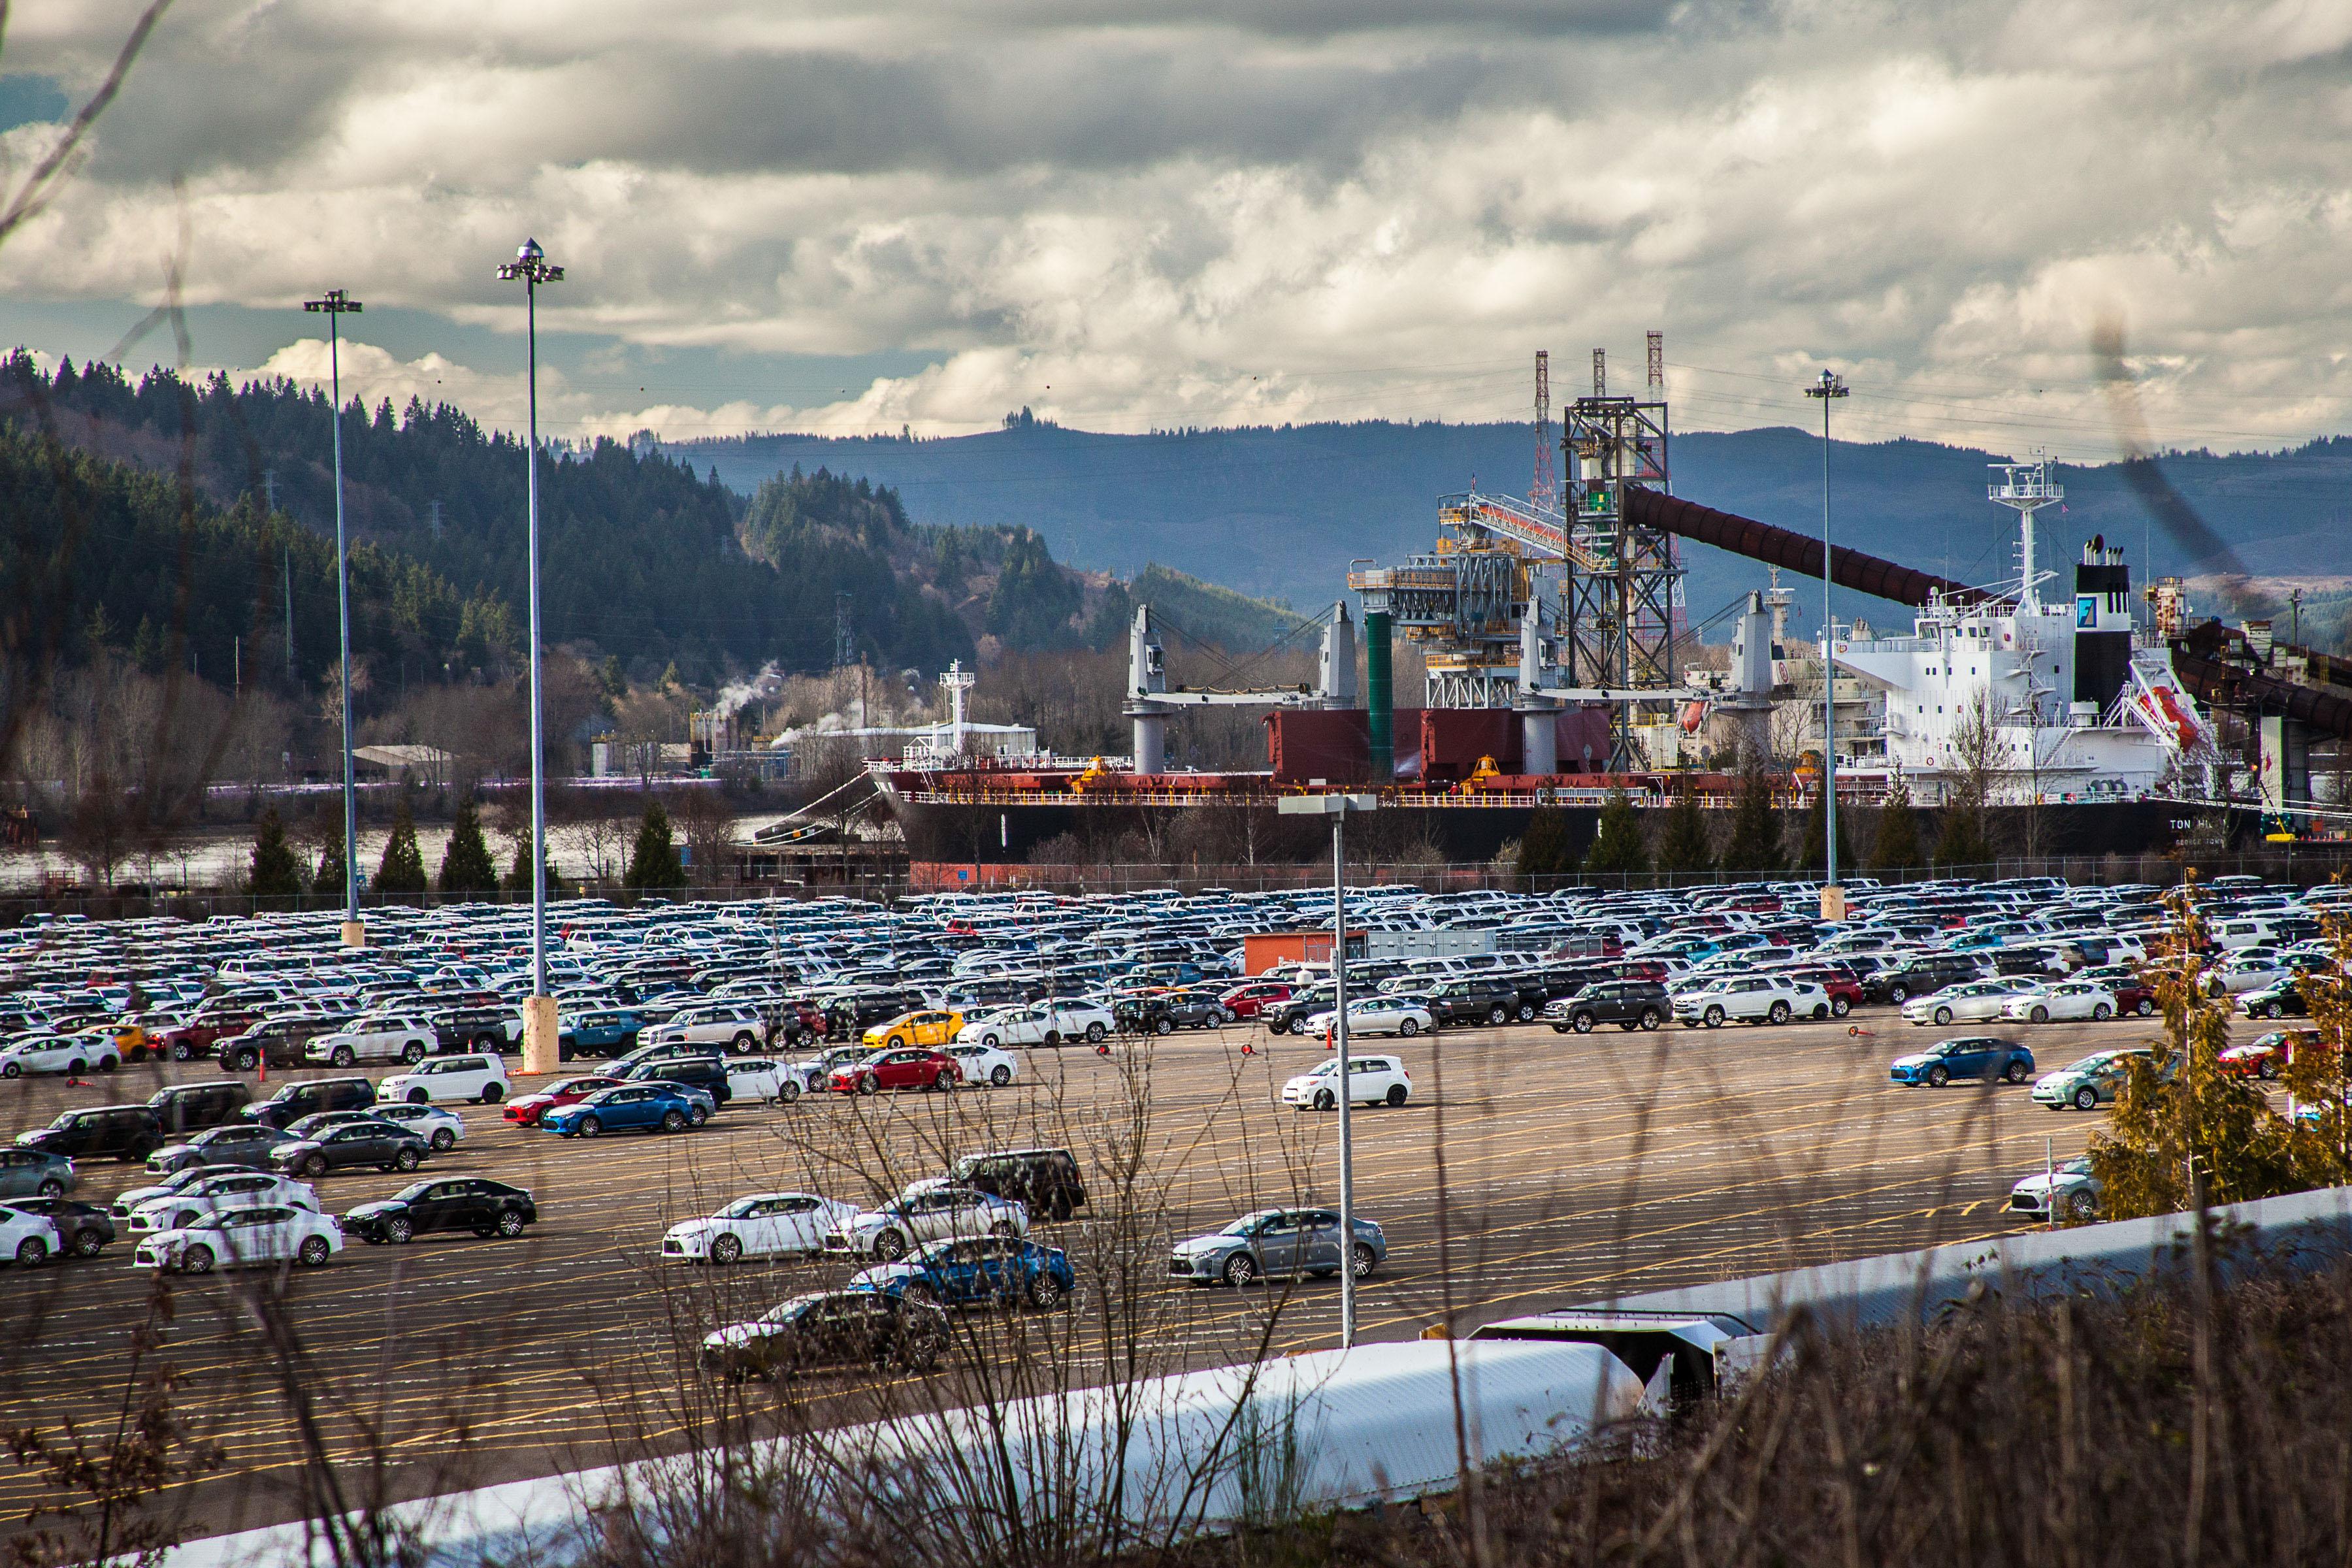 Parking lot cars unloaded at Terminal 4 Portland Oregon